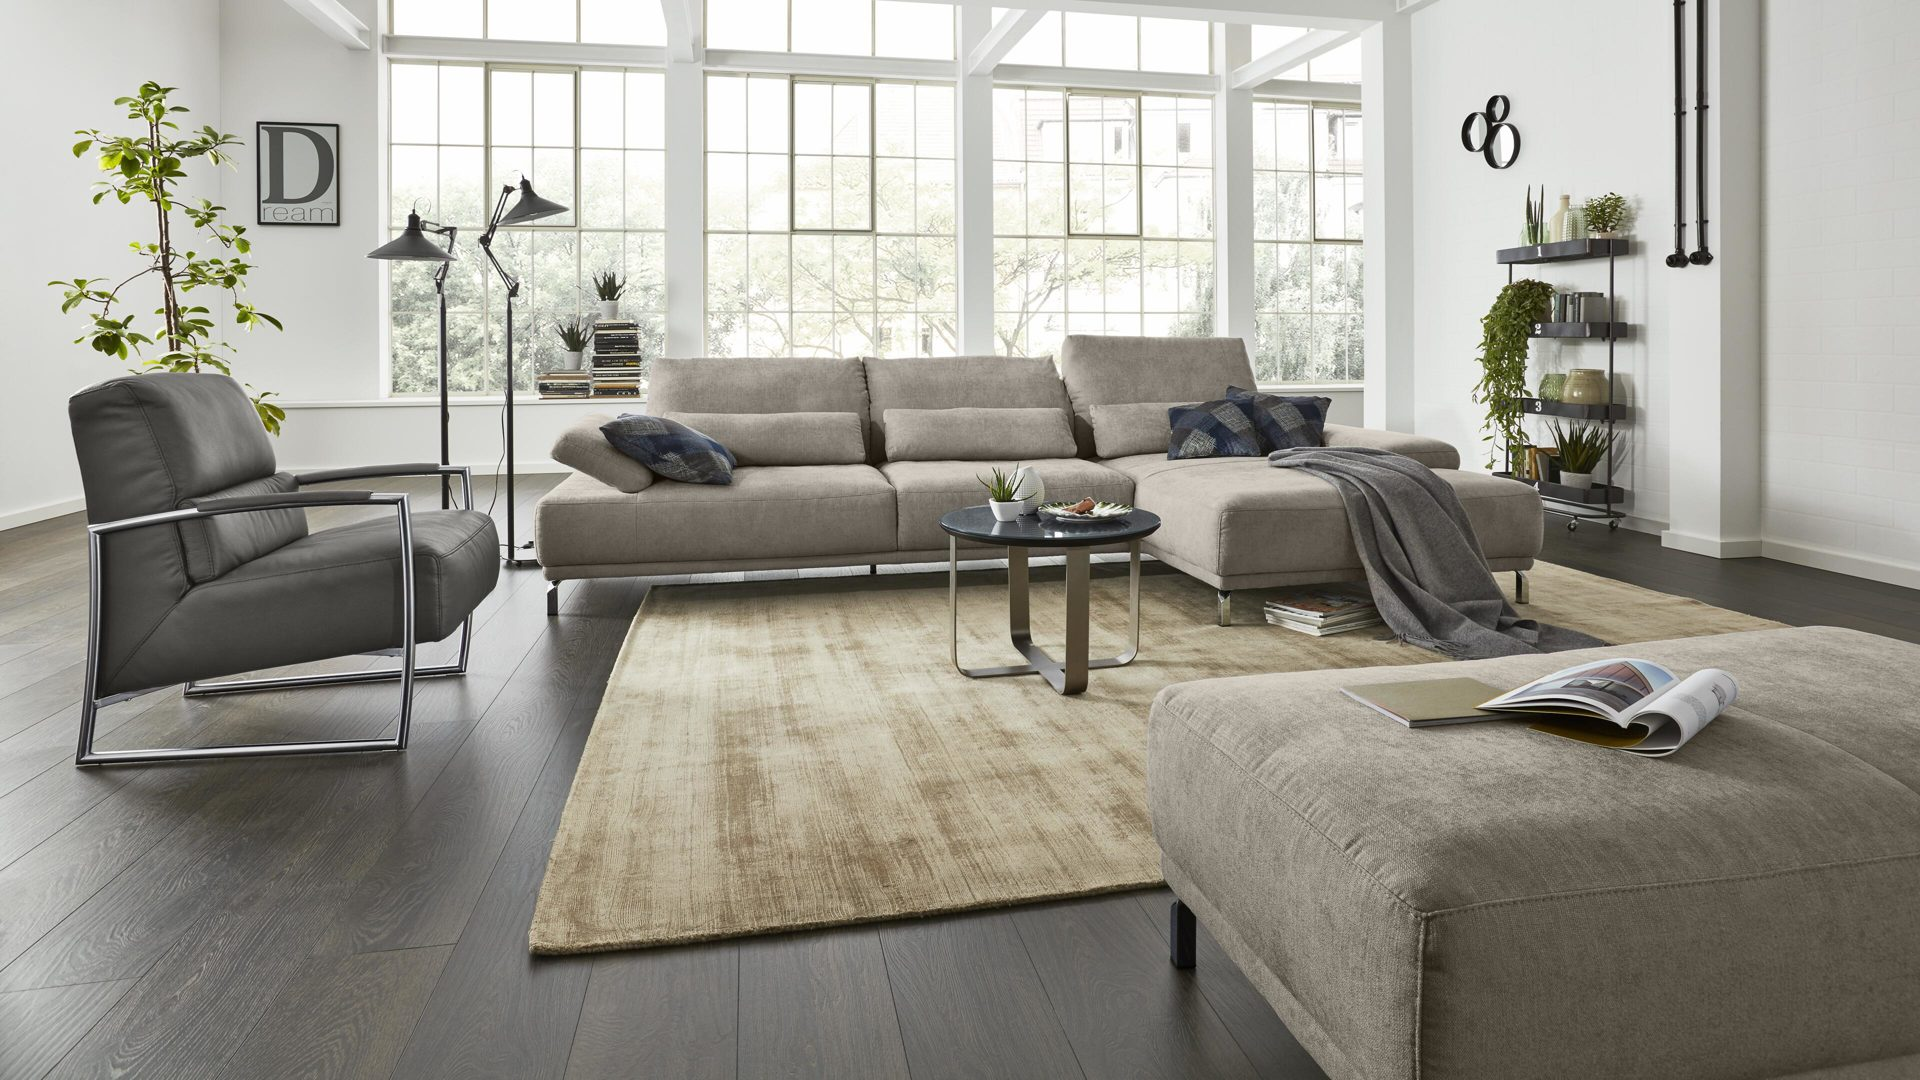 Interliving Sofa Serie 4150 Eckkombination Silberfarbener